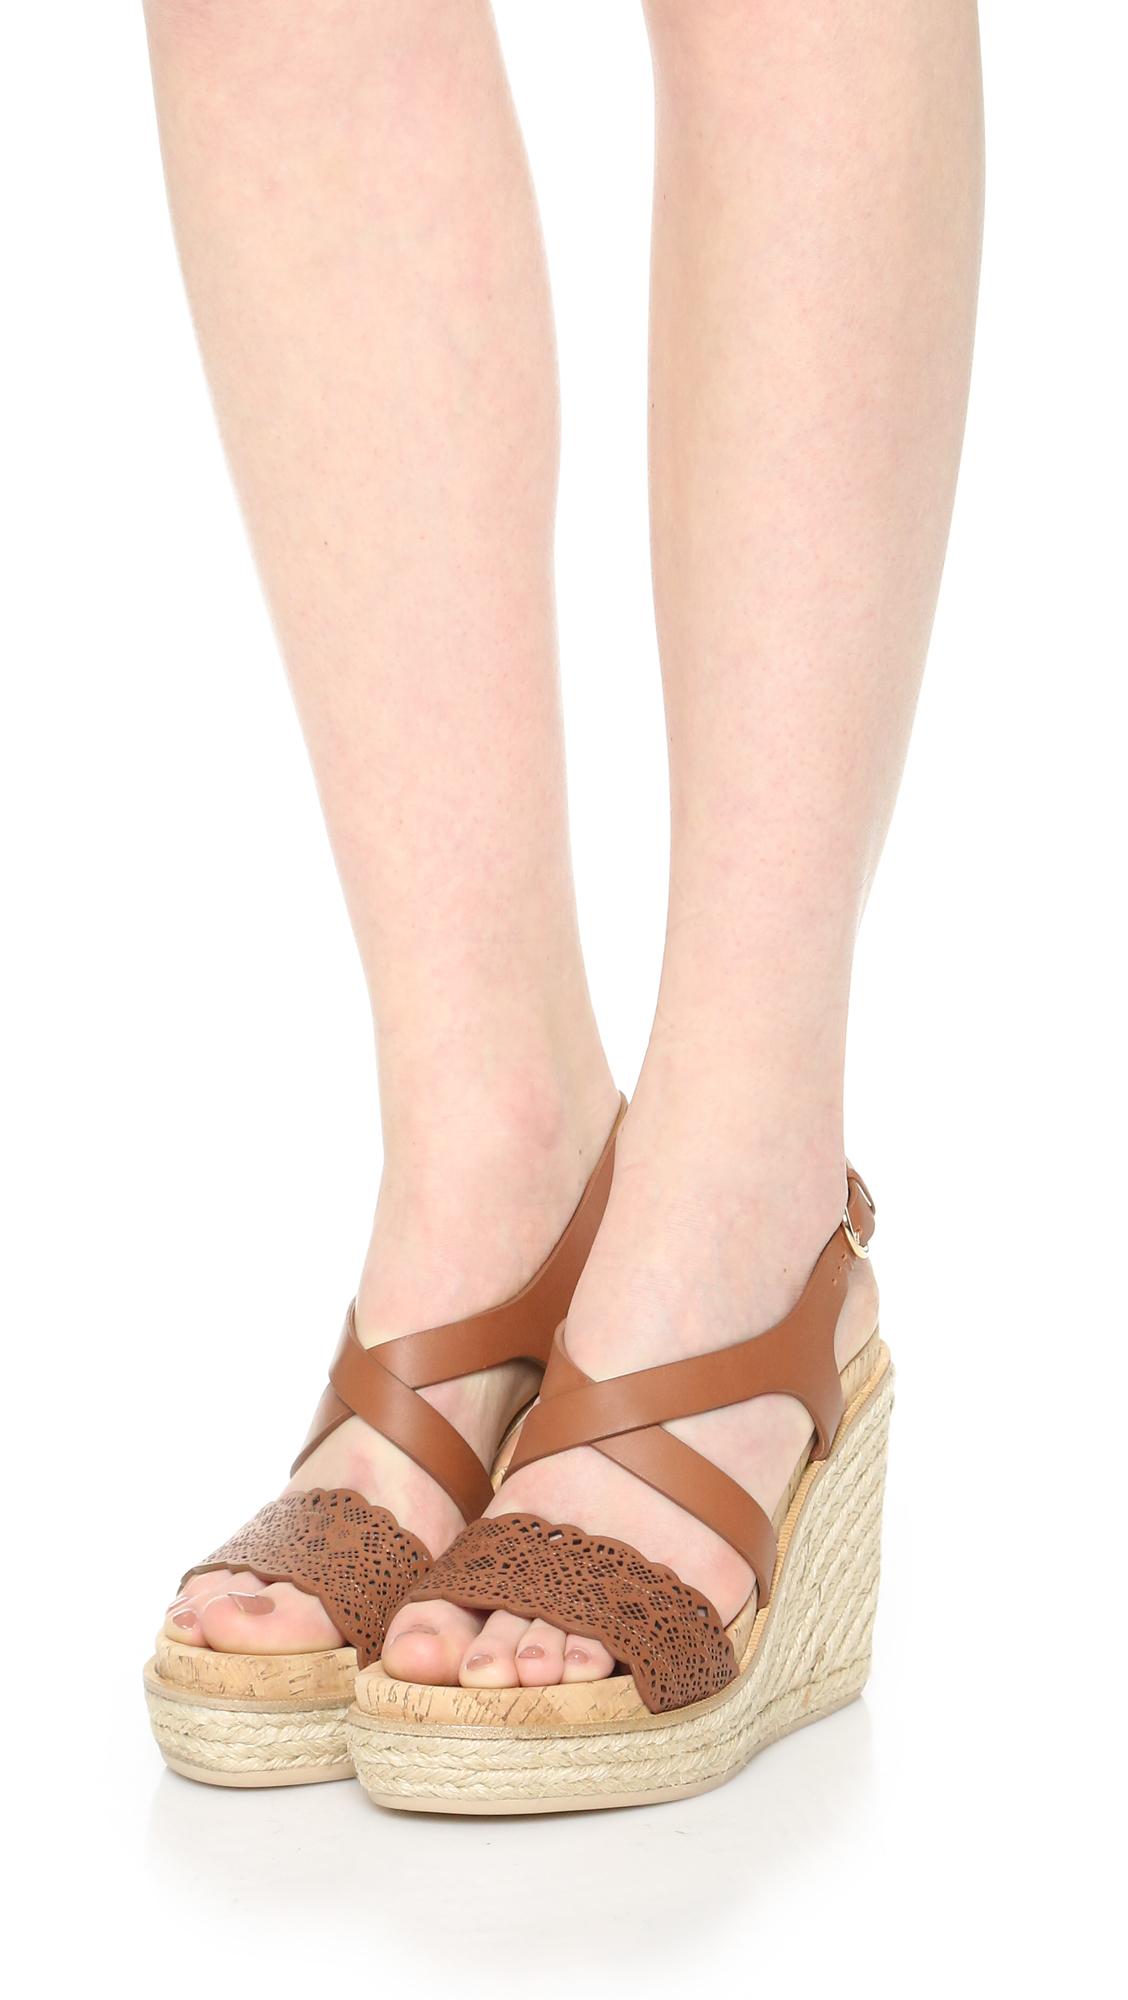 32d35a5ca6b Lyst - Ferragamo Gioela Wedge Sandals in Natural